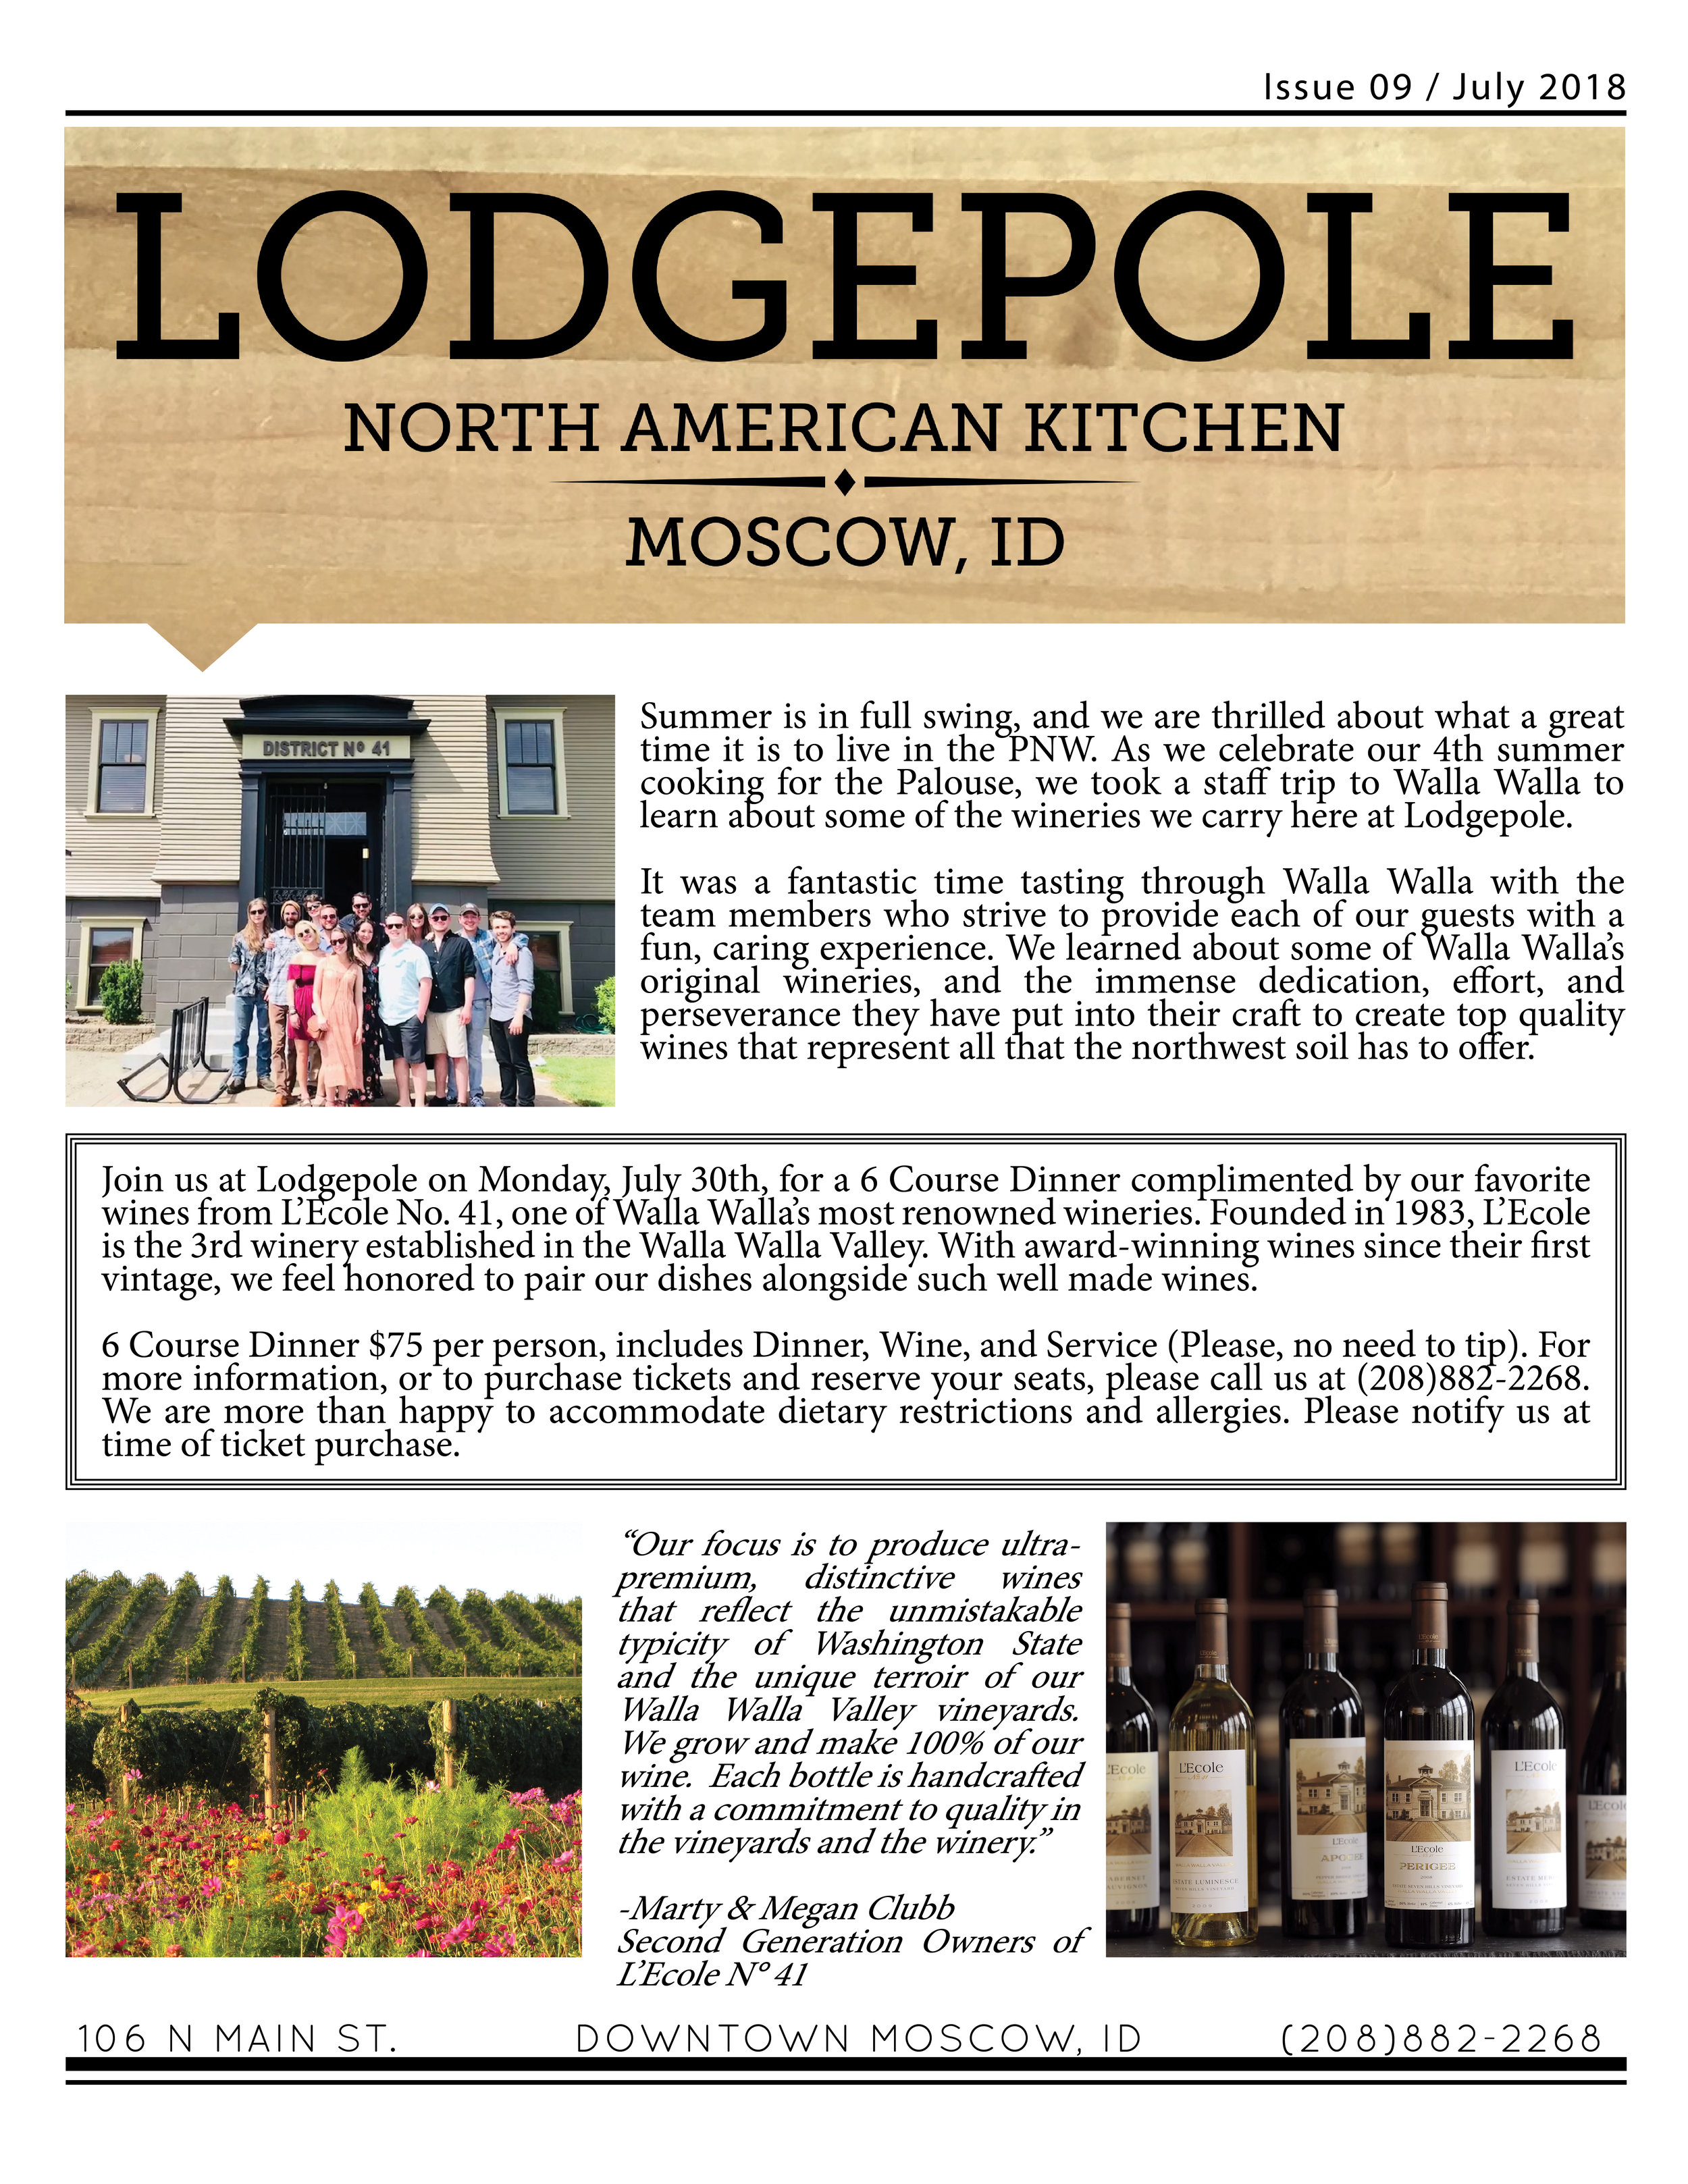 Lodgepole Newsletter July 2018